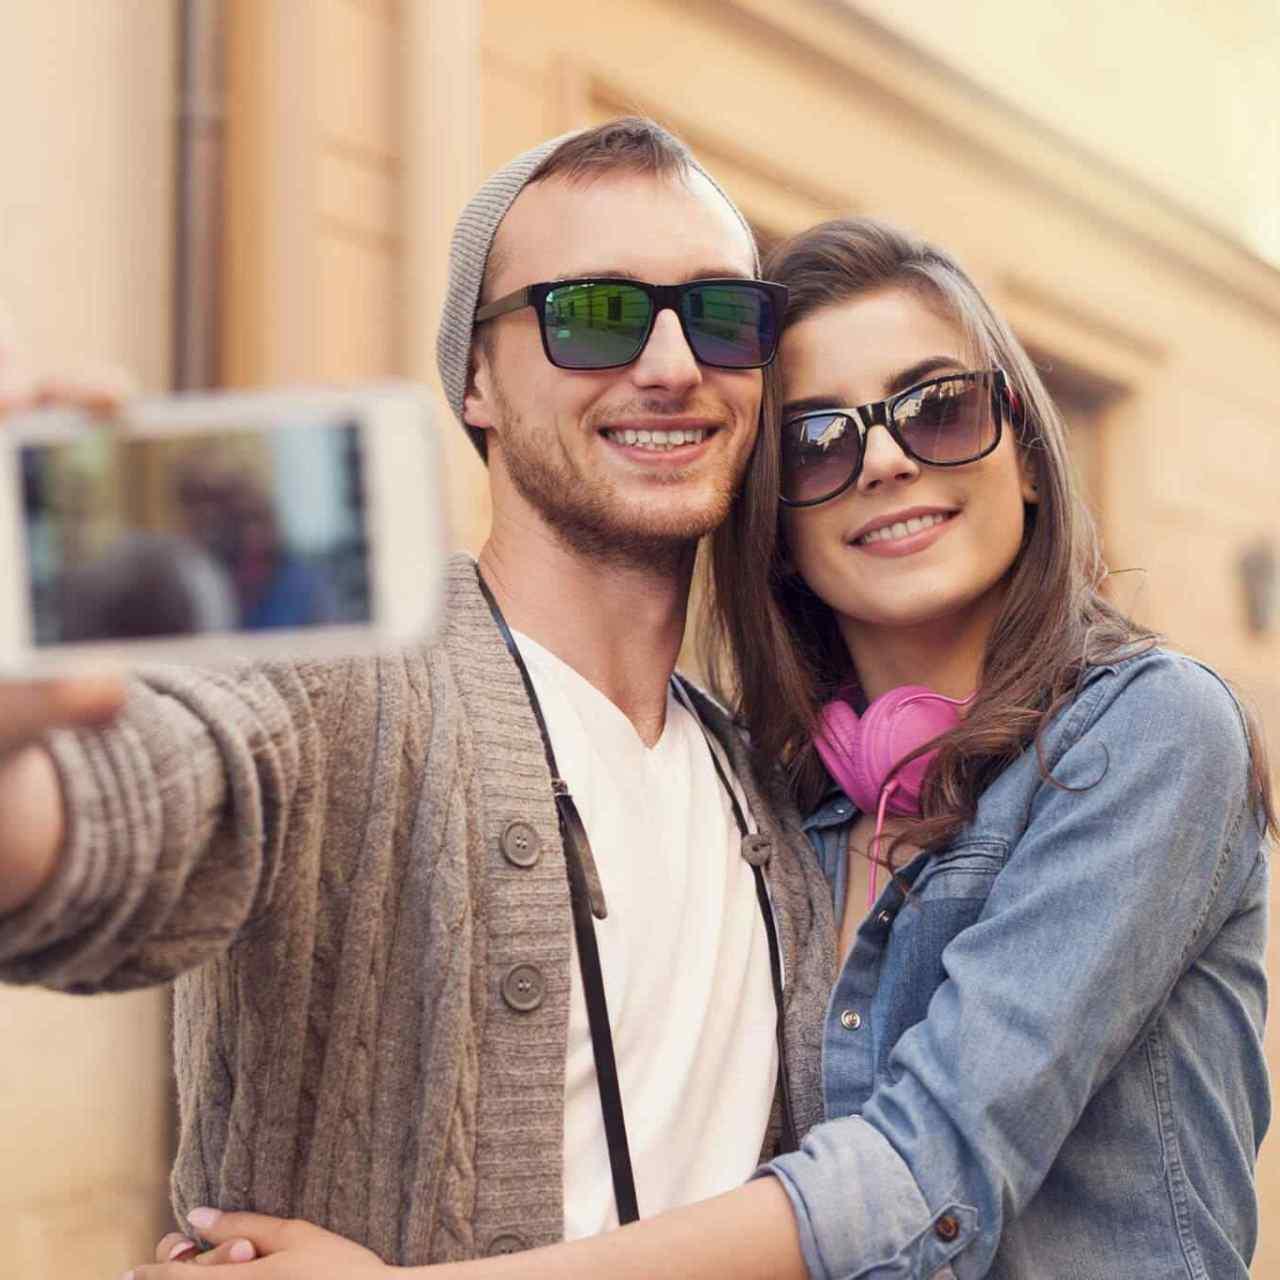 https://i0.wp.com/truhap.com/wp-content/uploads/2018/01/img-event-marriage-02.jpg?resize=1280%2C1280&ssl=1